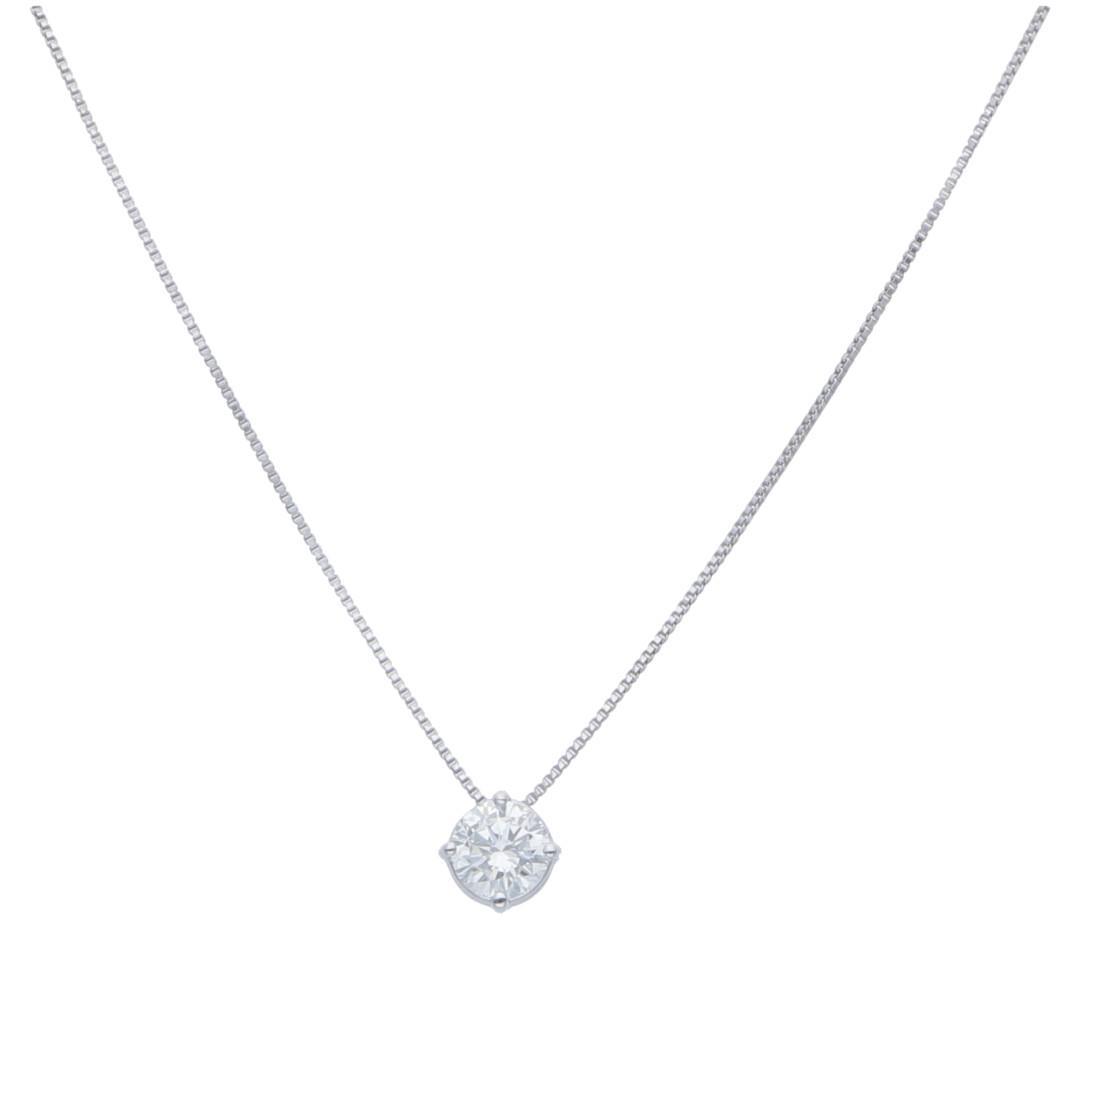 Collana punto luce con diamanti ct 0,53 - ALFIERI & ST. JOHN